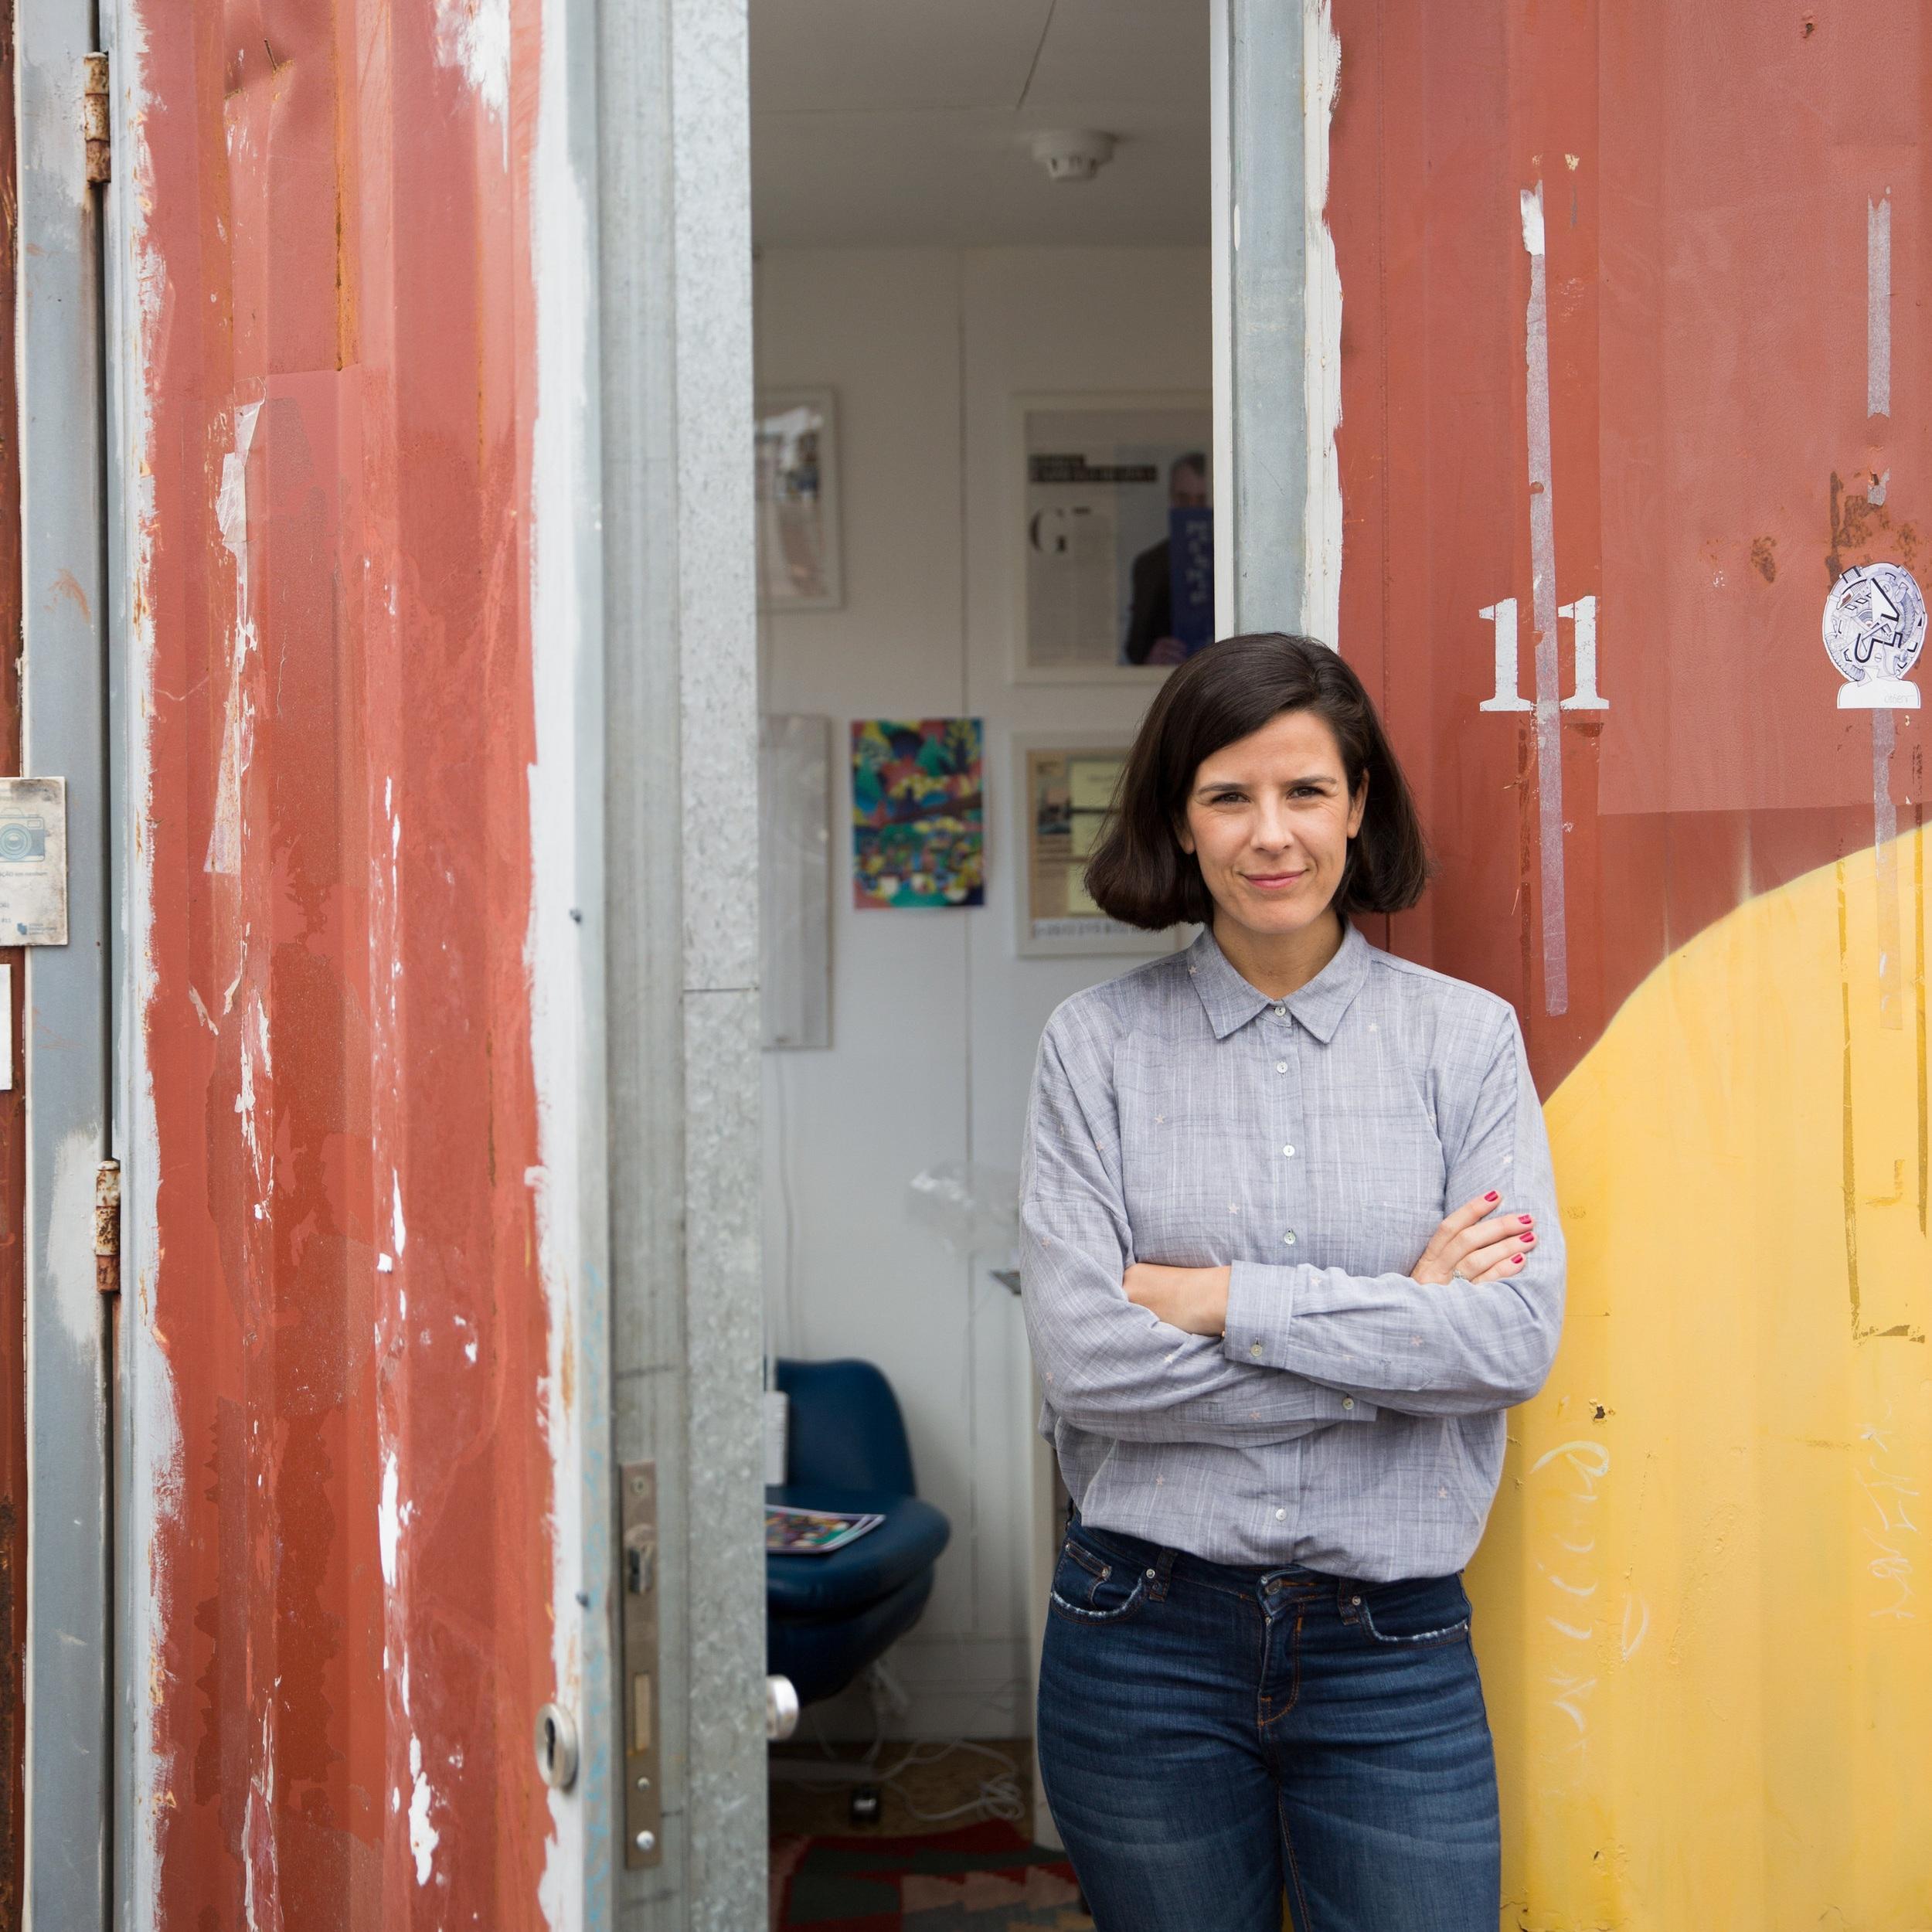 MARIANA DUARTE SILVA / VILLAGE UNDERGROUND LISBOA / PORTUGAL